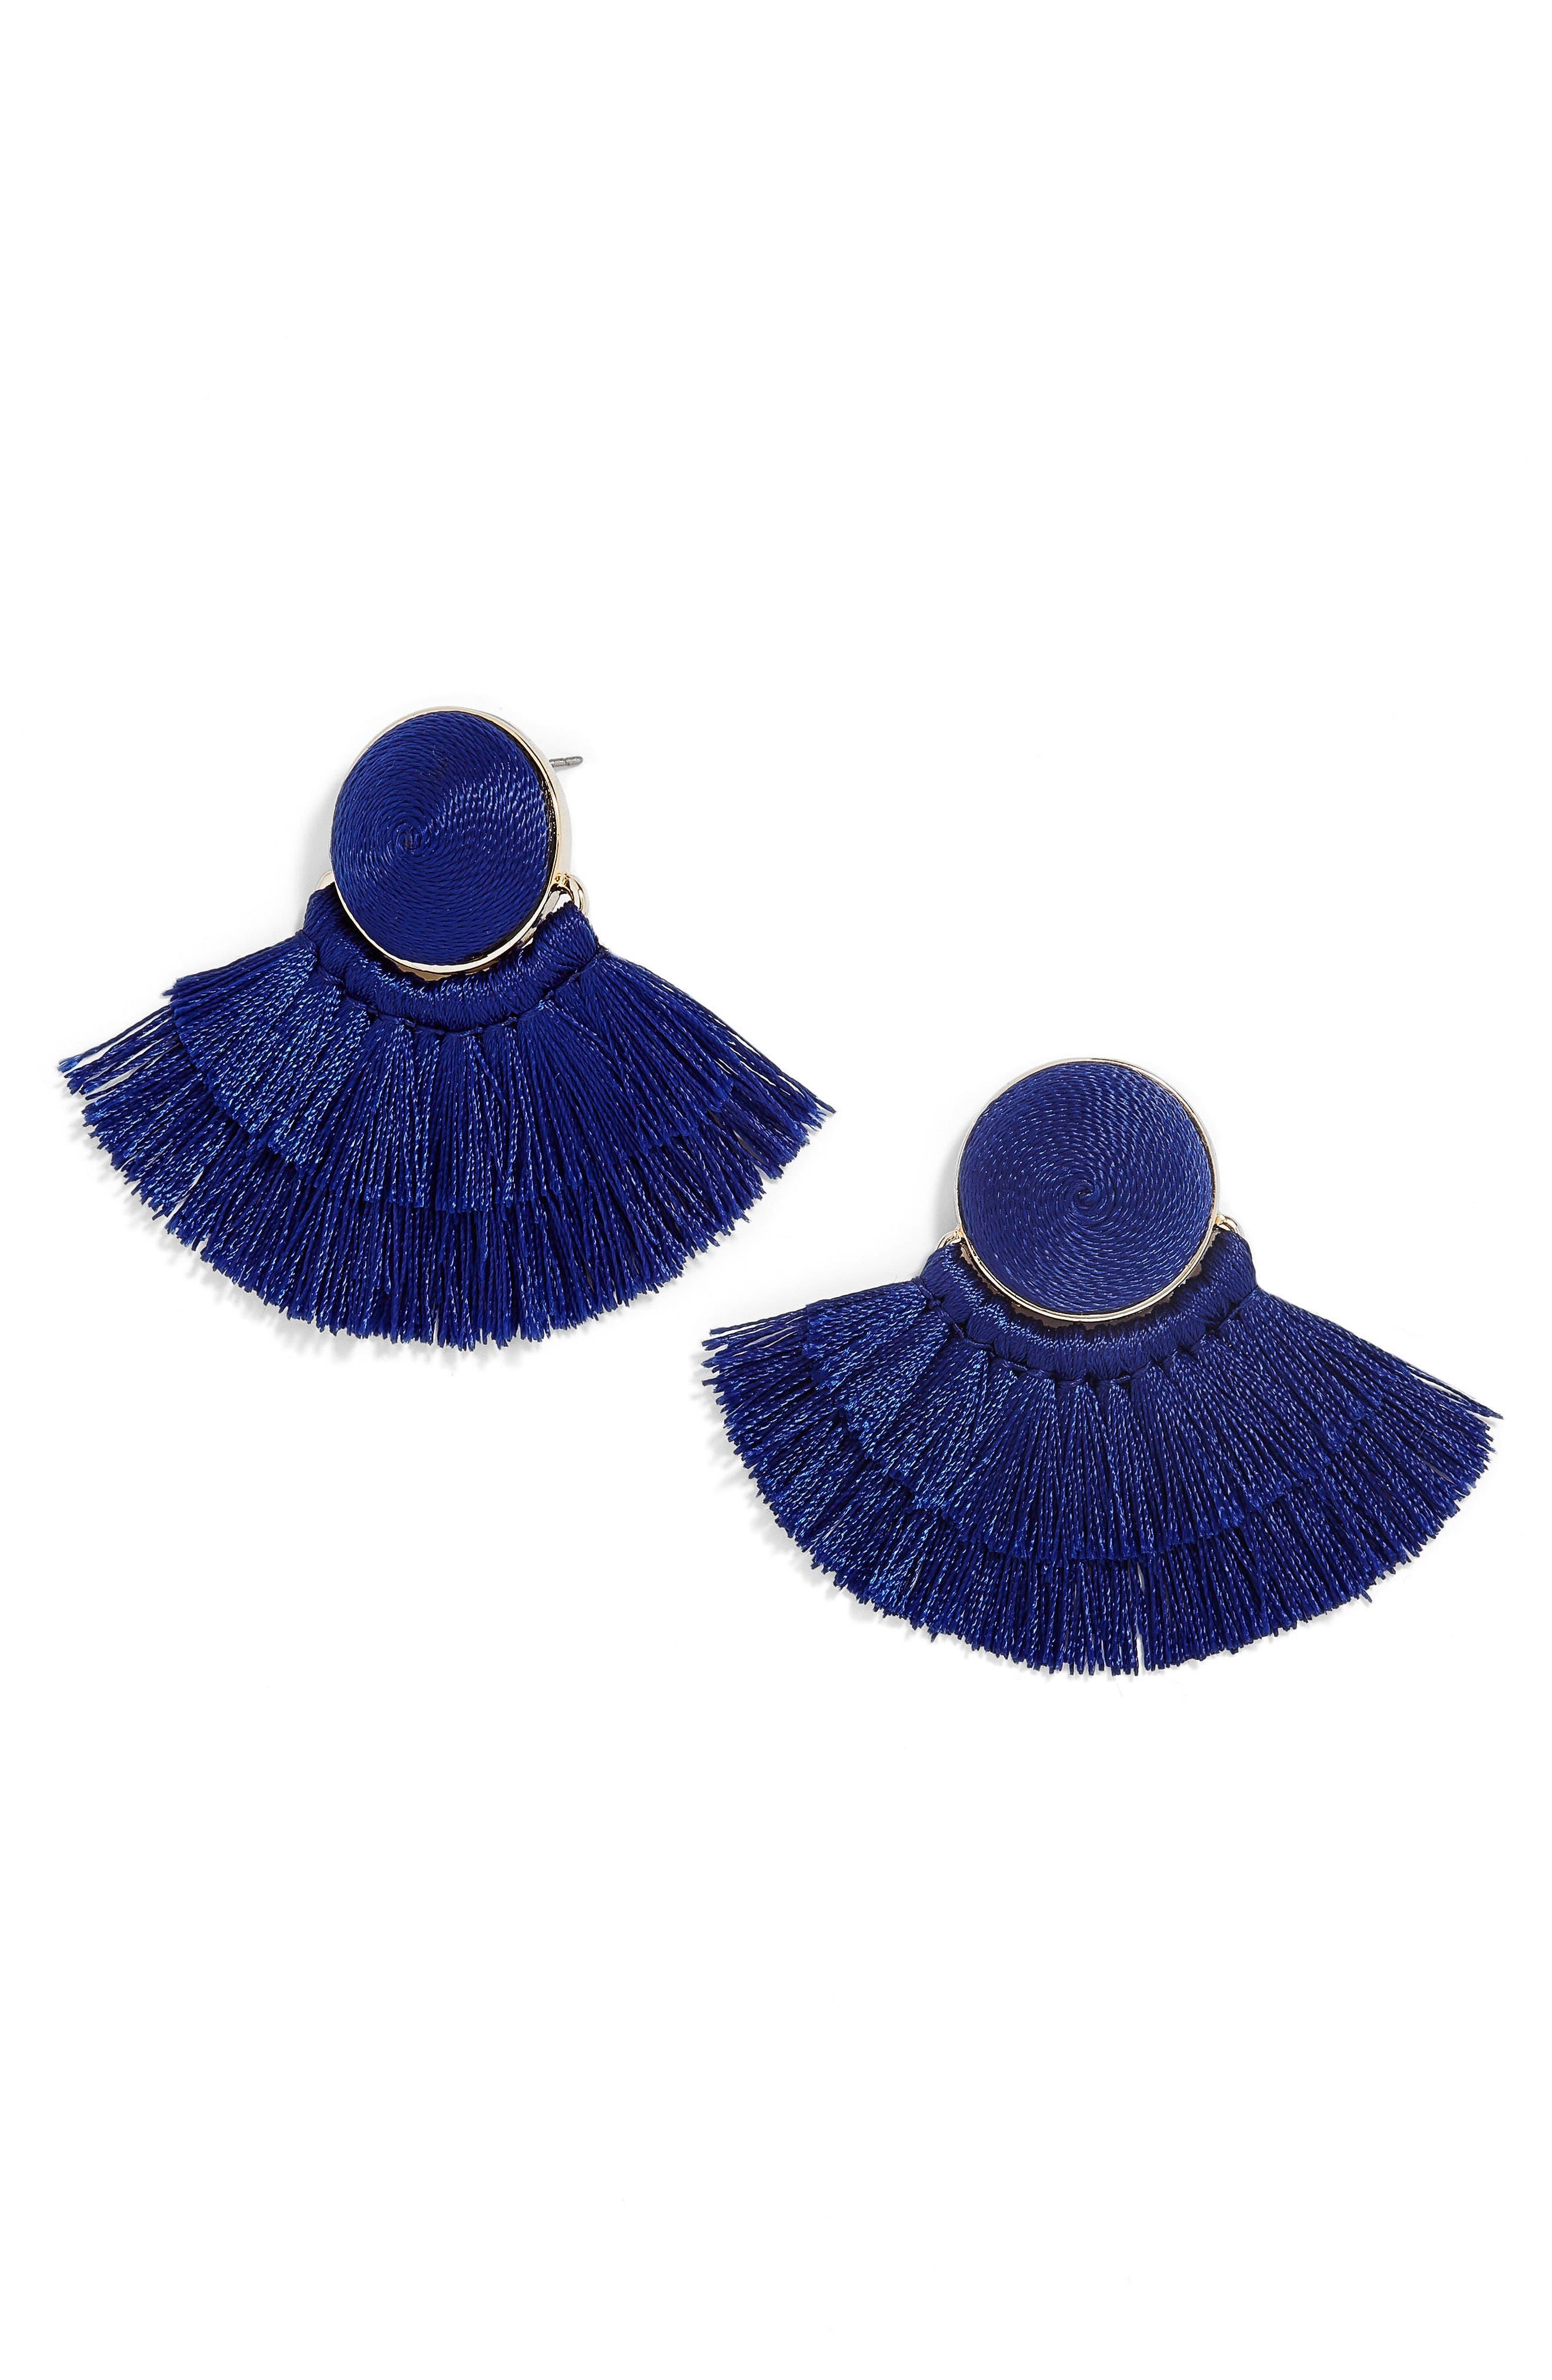 Main Image - BaubleBar Martina Chubby Deco Fringe Drop Earrings